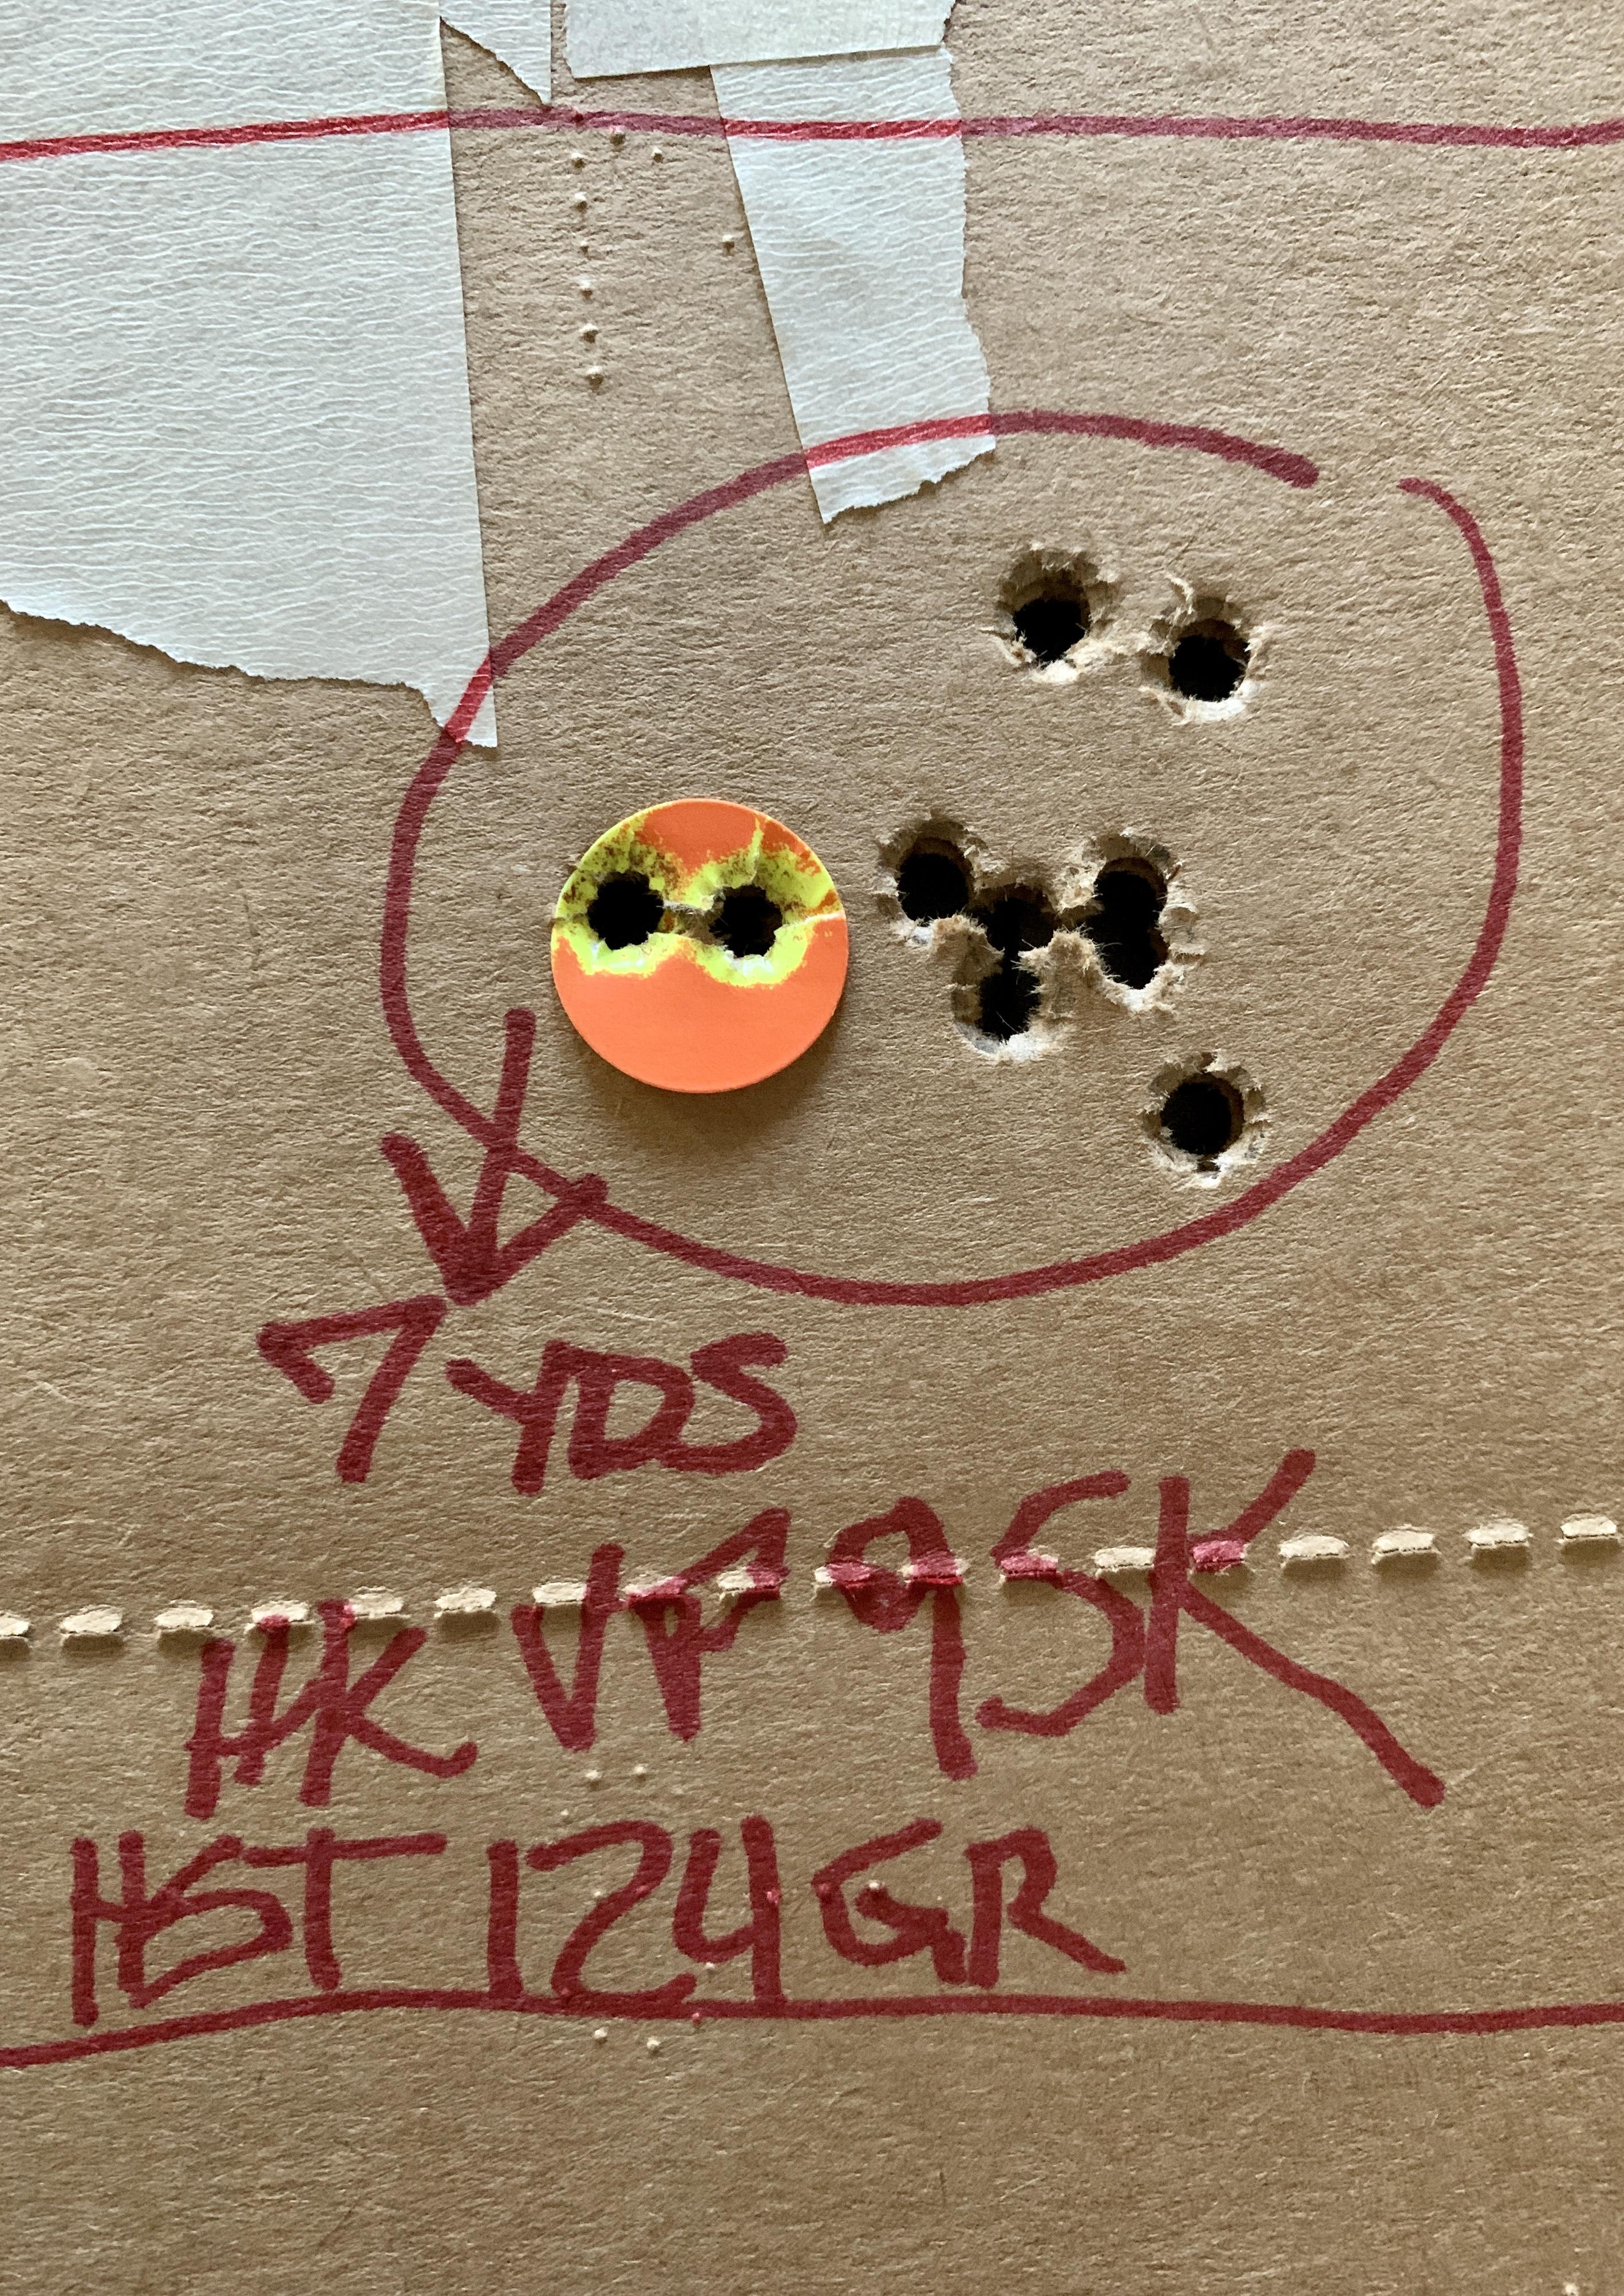 NGD - HK VP9SK LE  - Will it replace my VP9-B-hk-vp9sk-fed-124gr-hst.jpg